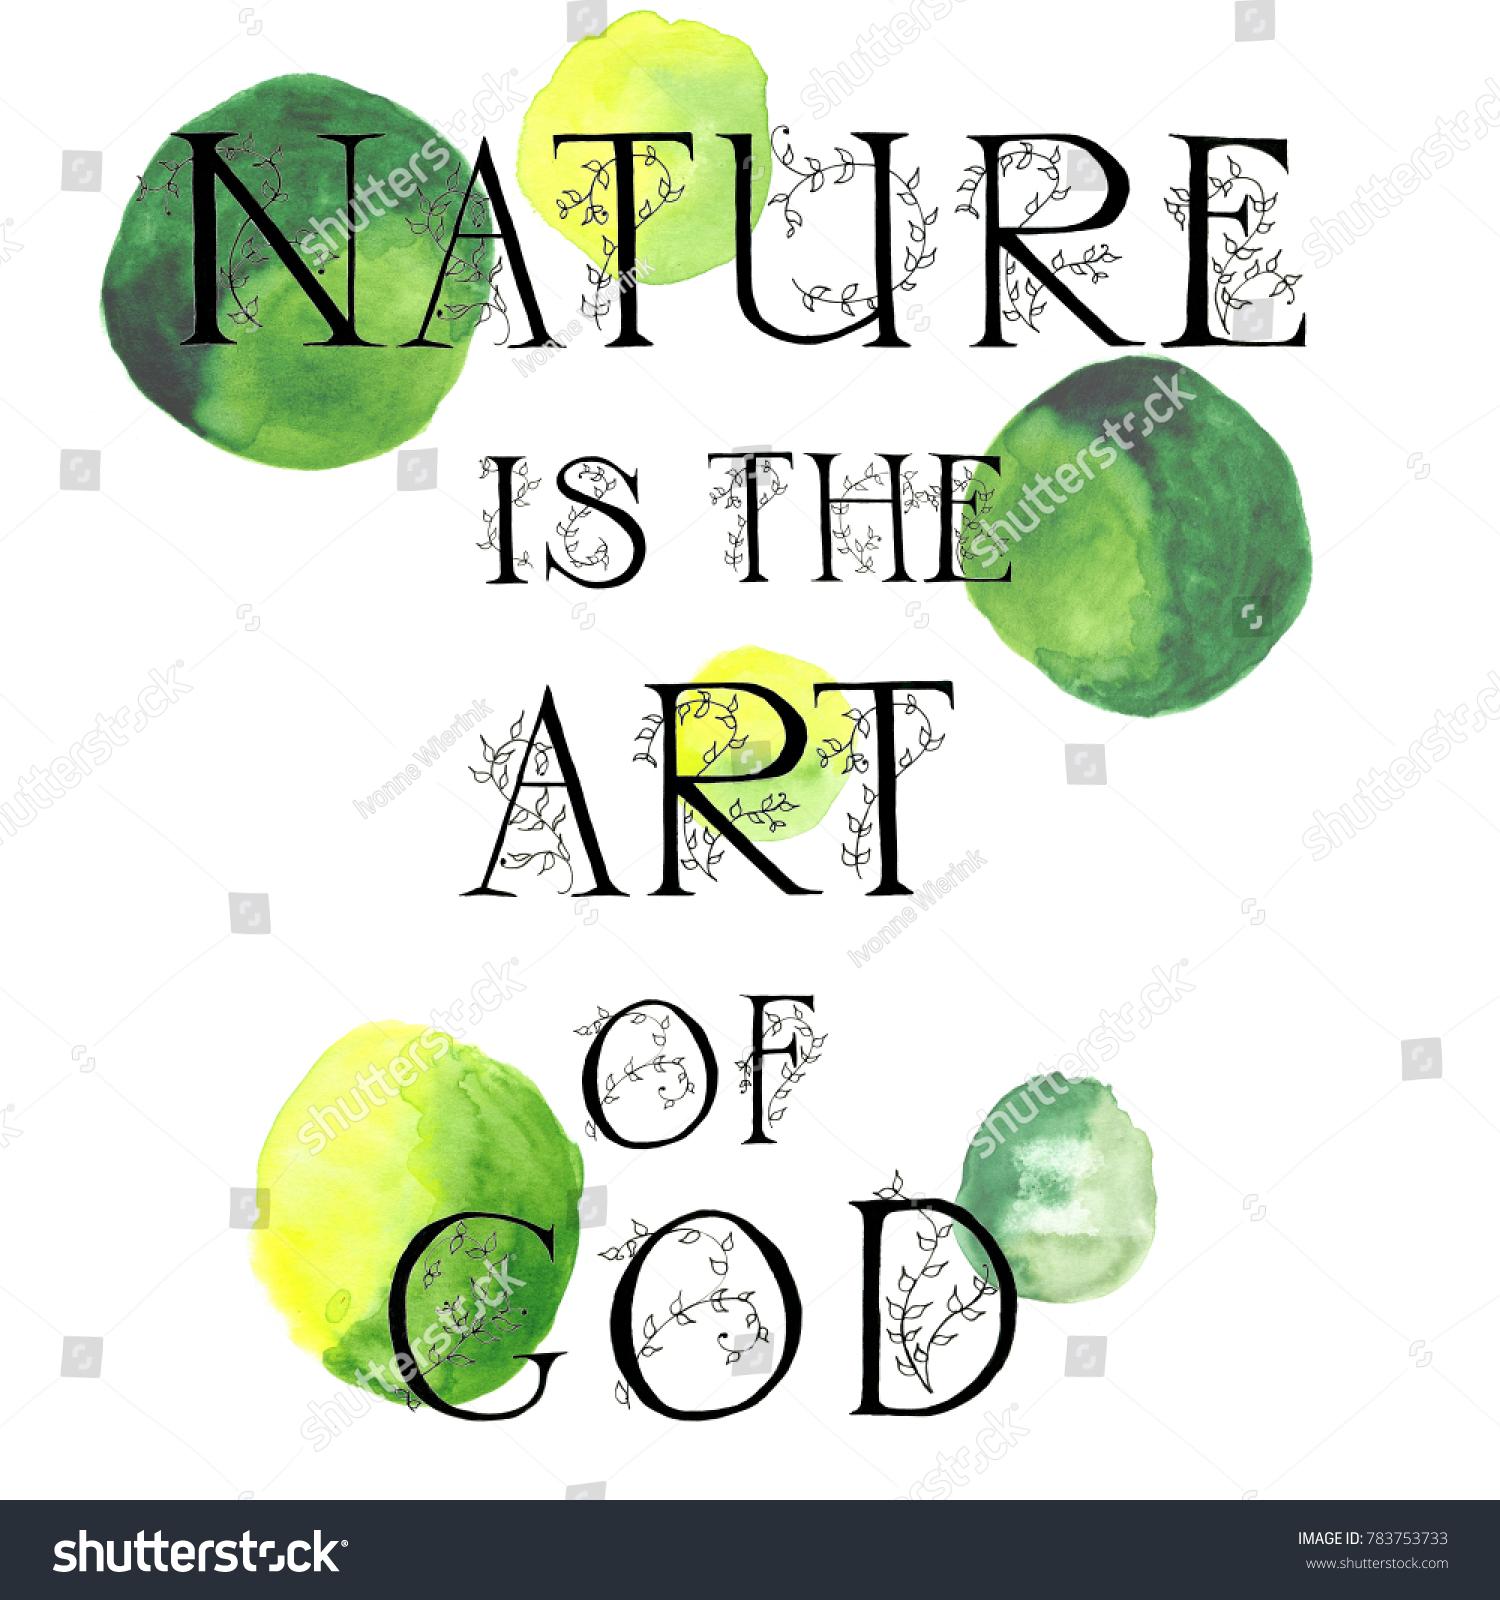 Royalty Free Stock Illustration Of Hand Lettering Nature Art God